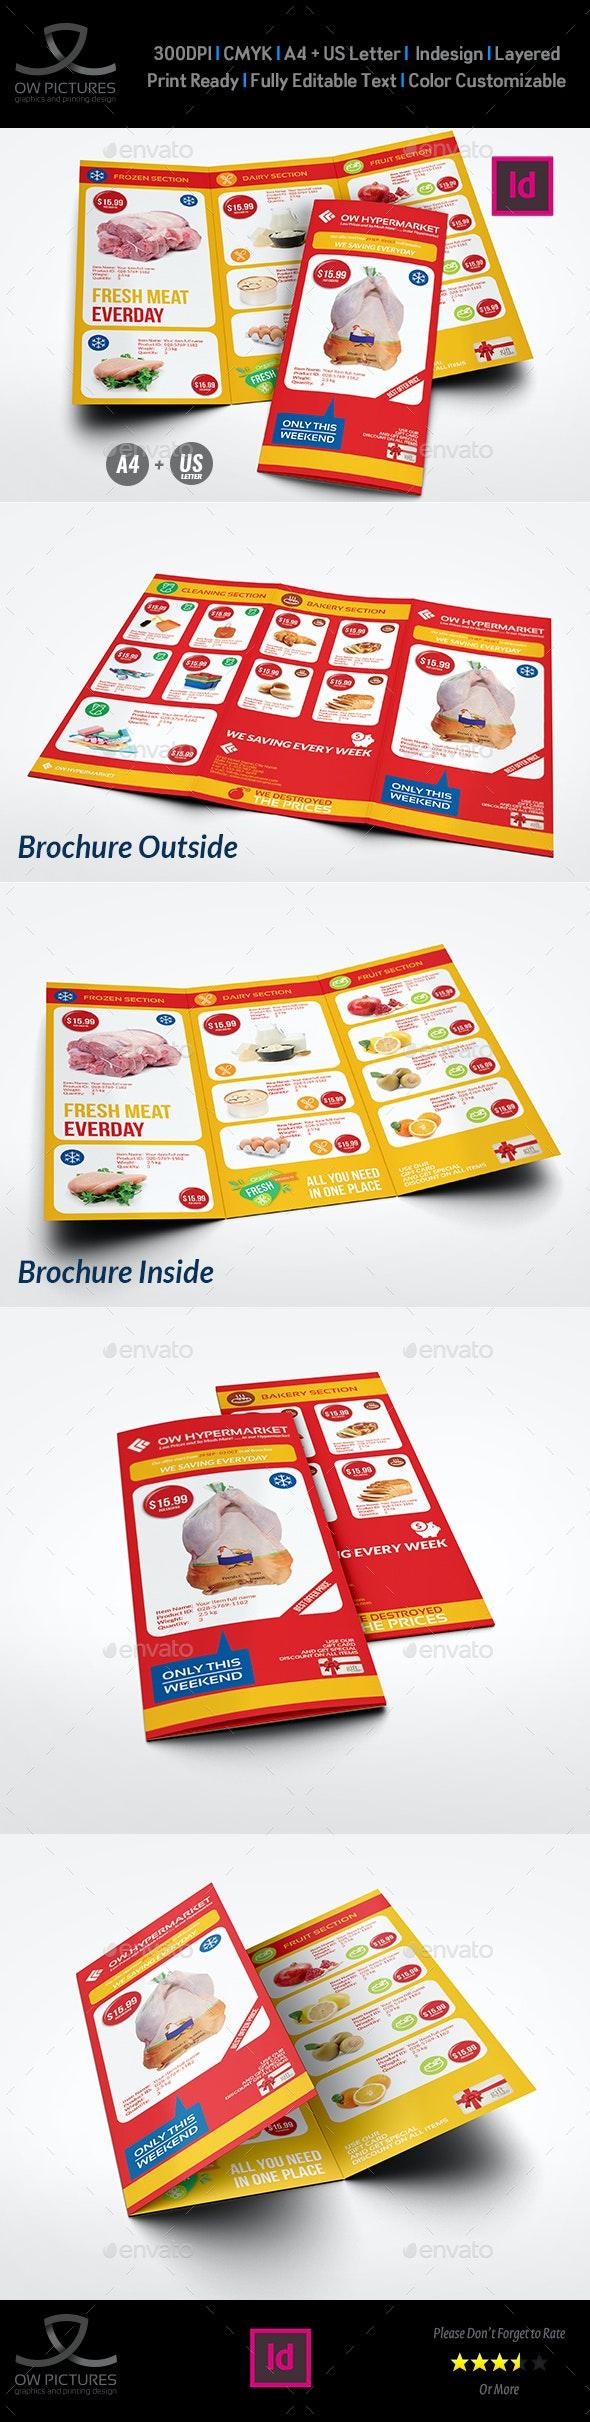 Supermarket Products Catalog Tri-Fold Brochure Vol.2 - Catalogs Brochures